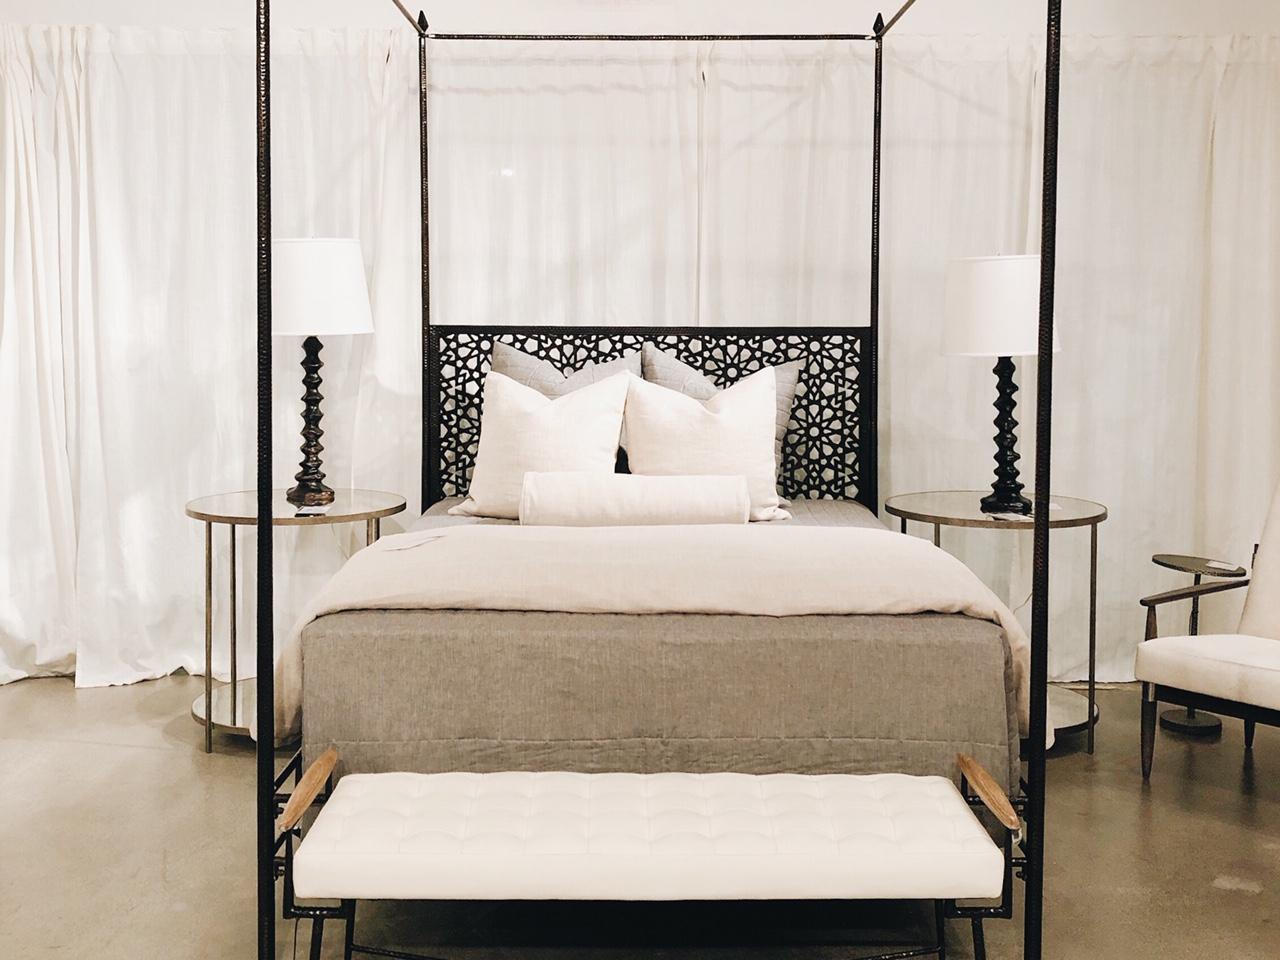 Nyla Free Designs Inc Las Vegas Furniture Market Highlights And